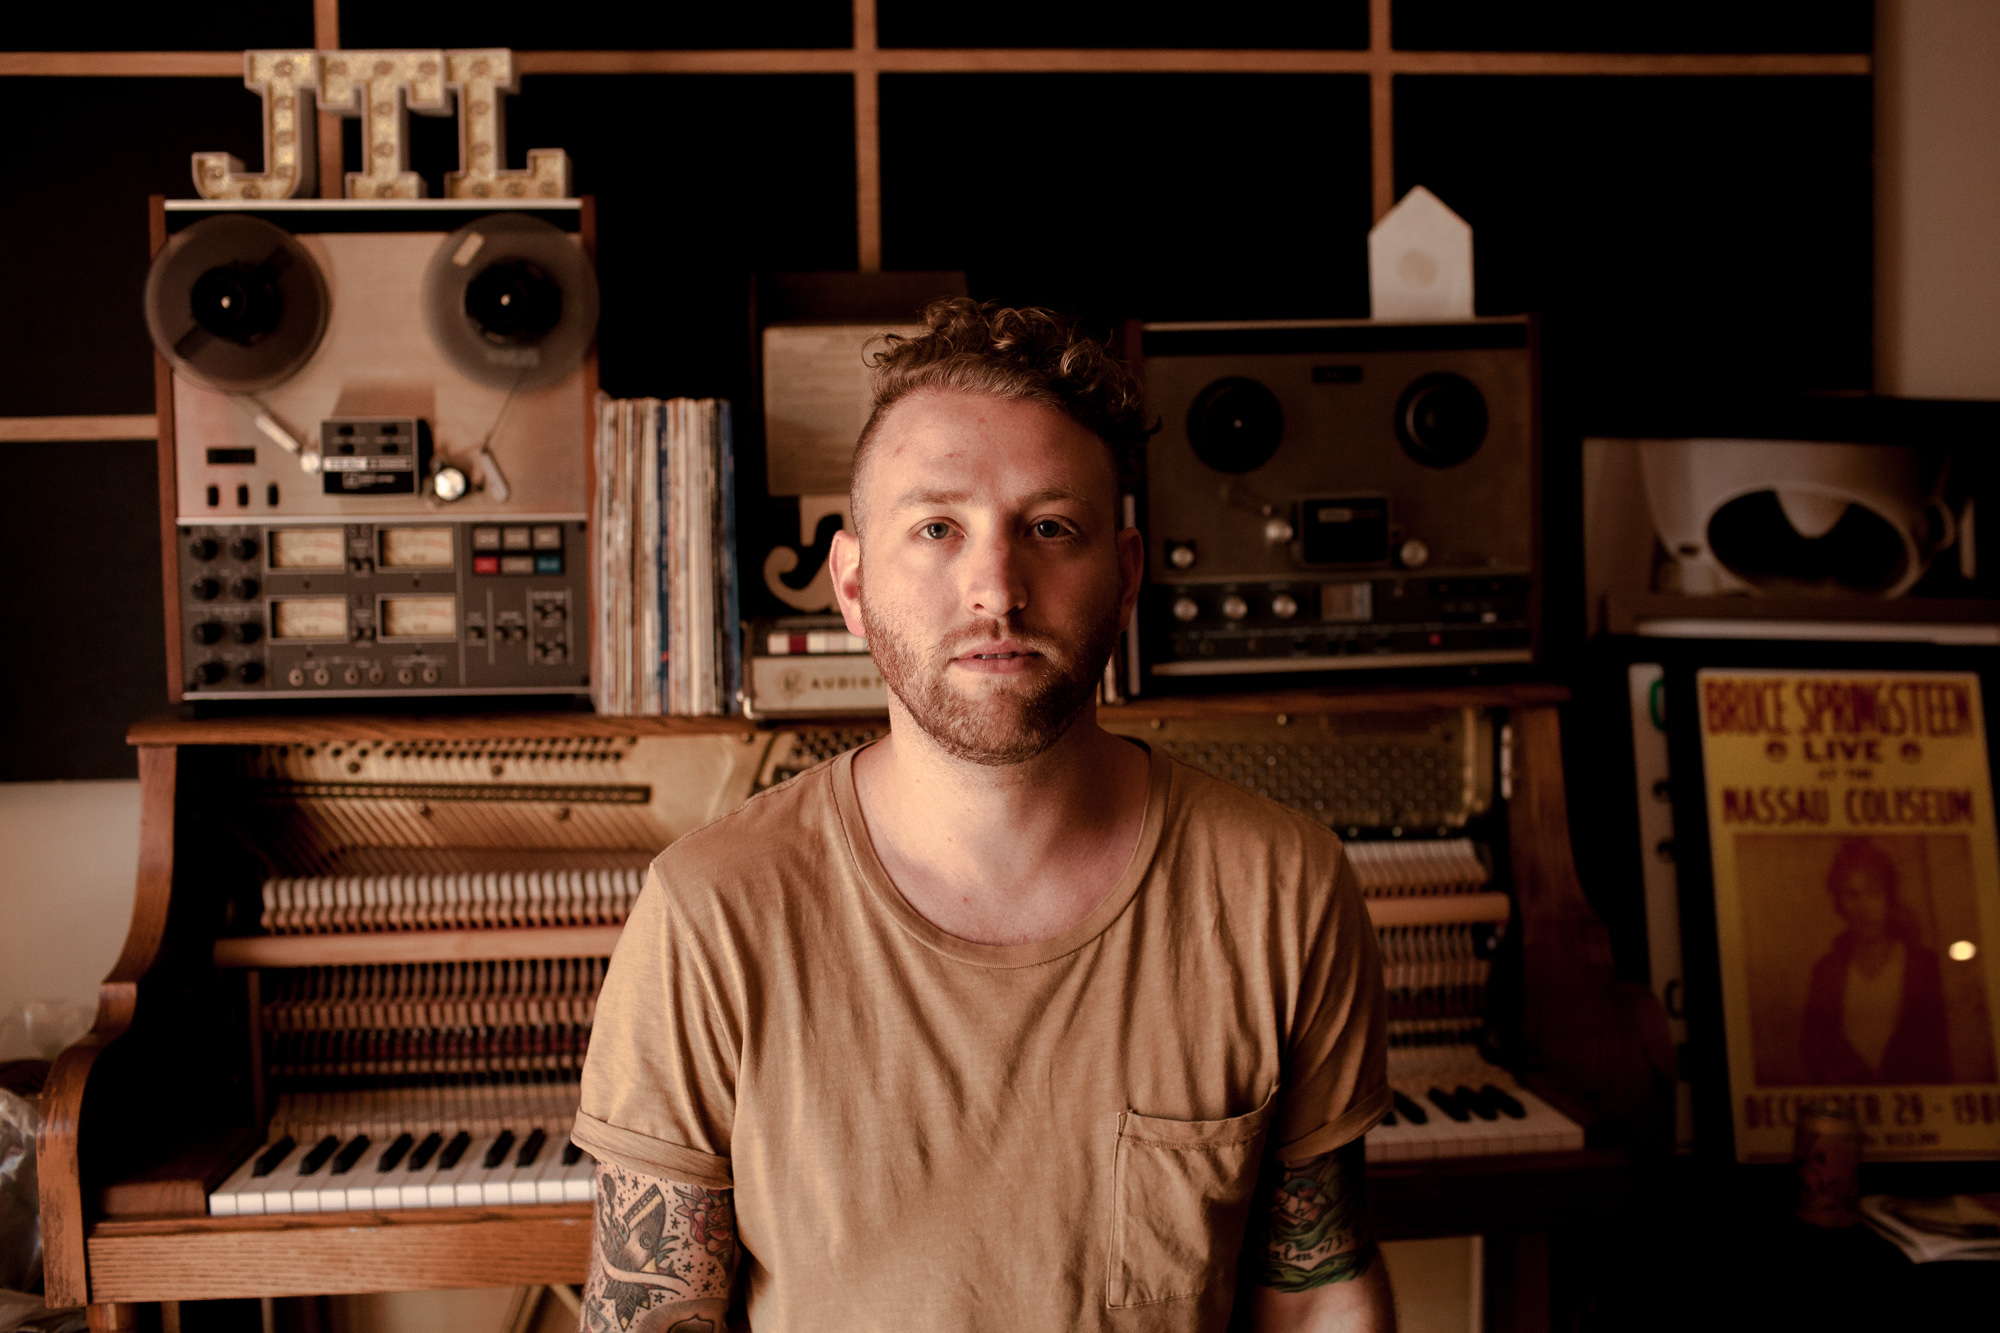 Zane Callister   Producer, Engineer, Songwriter